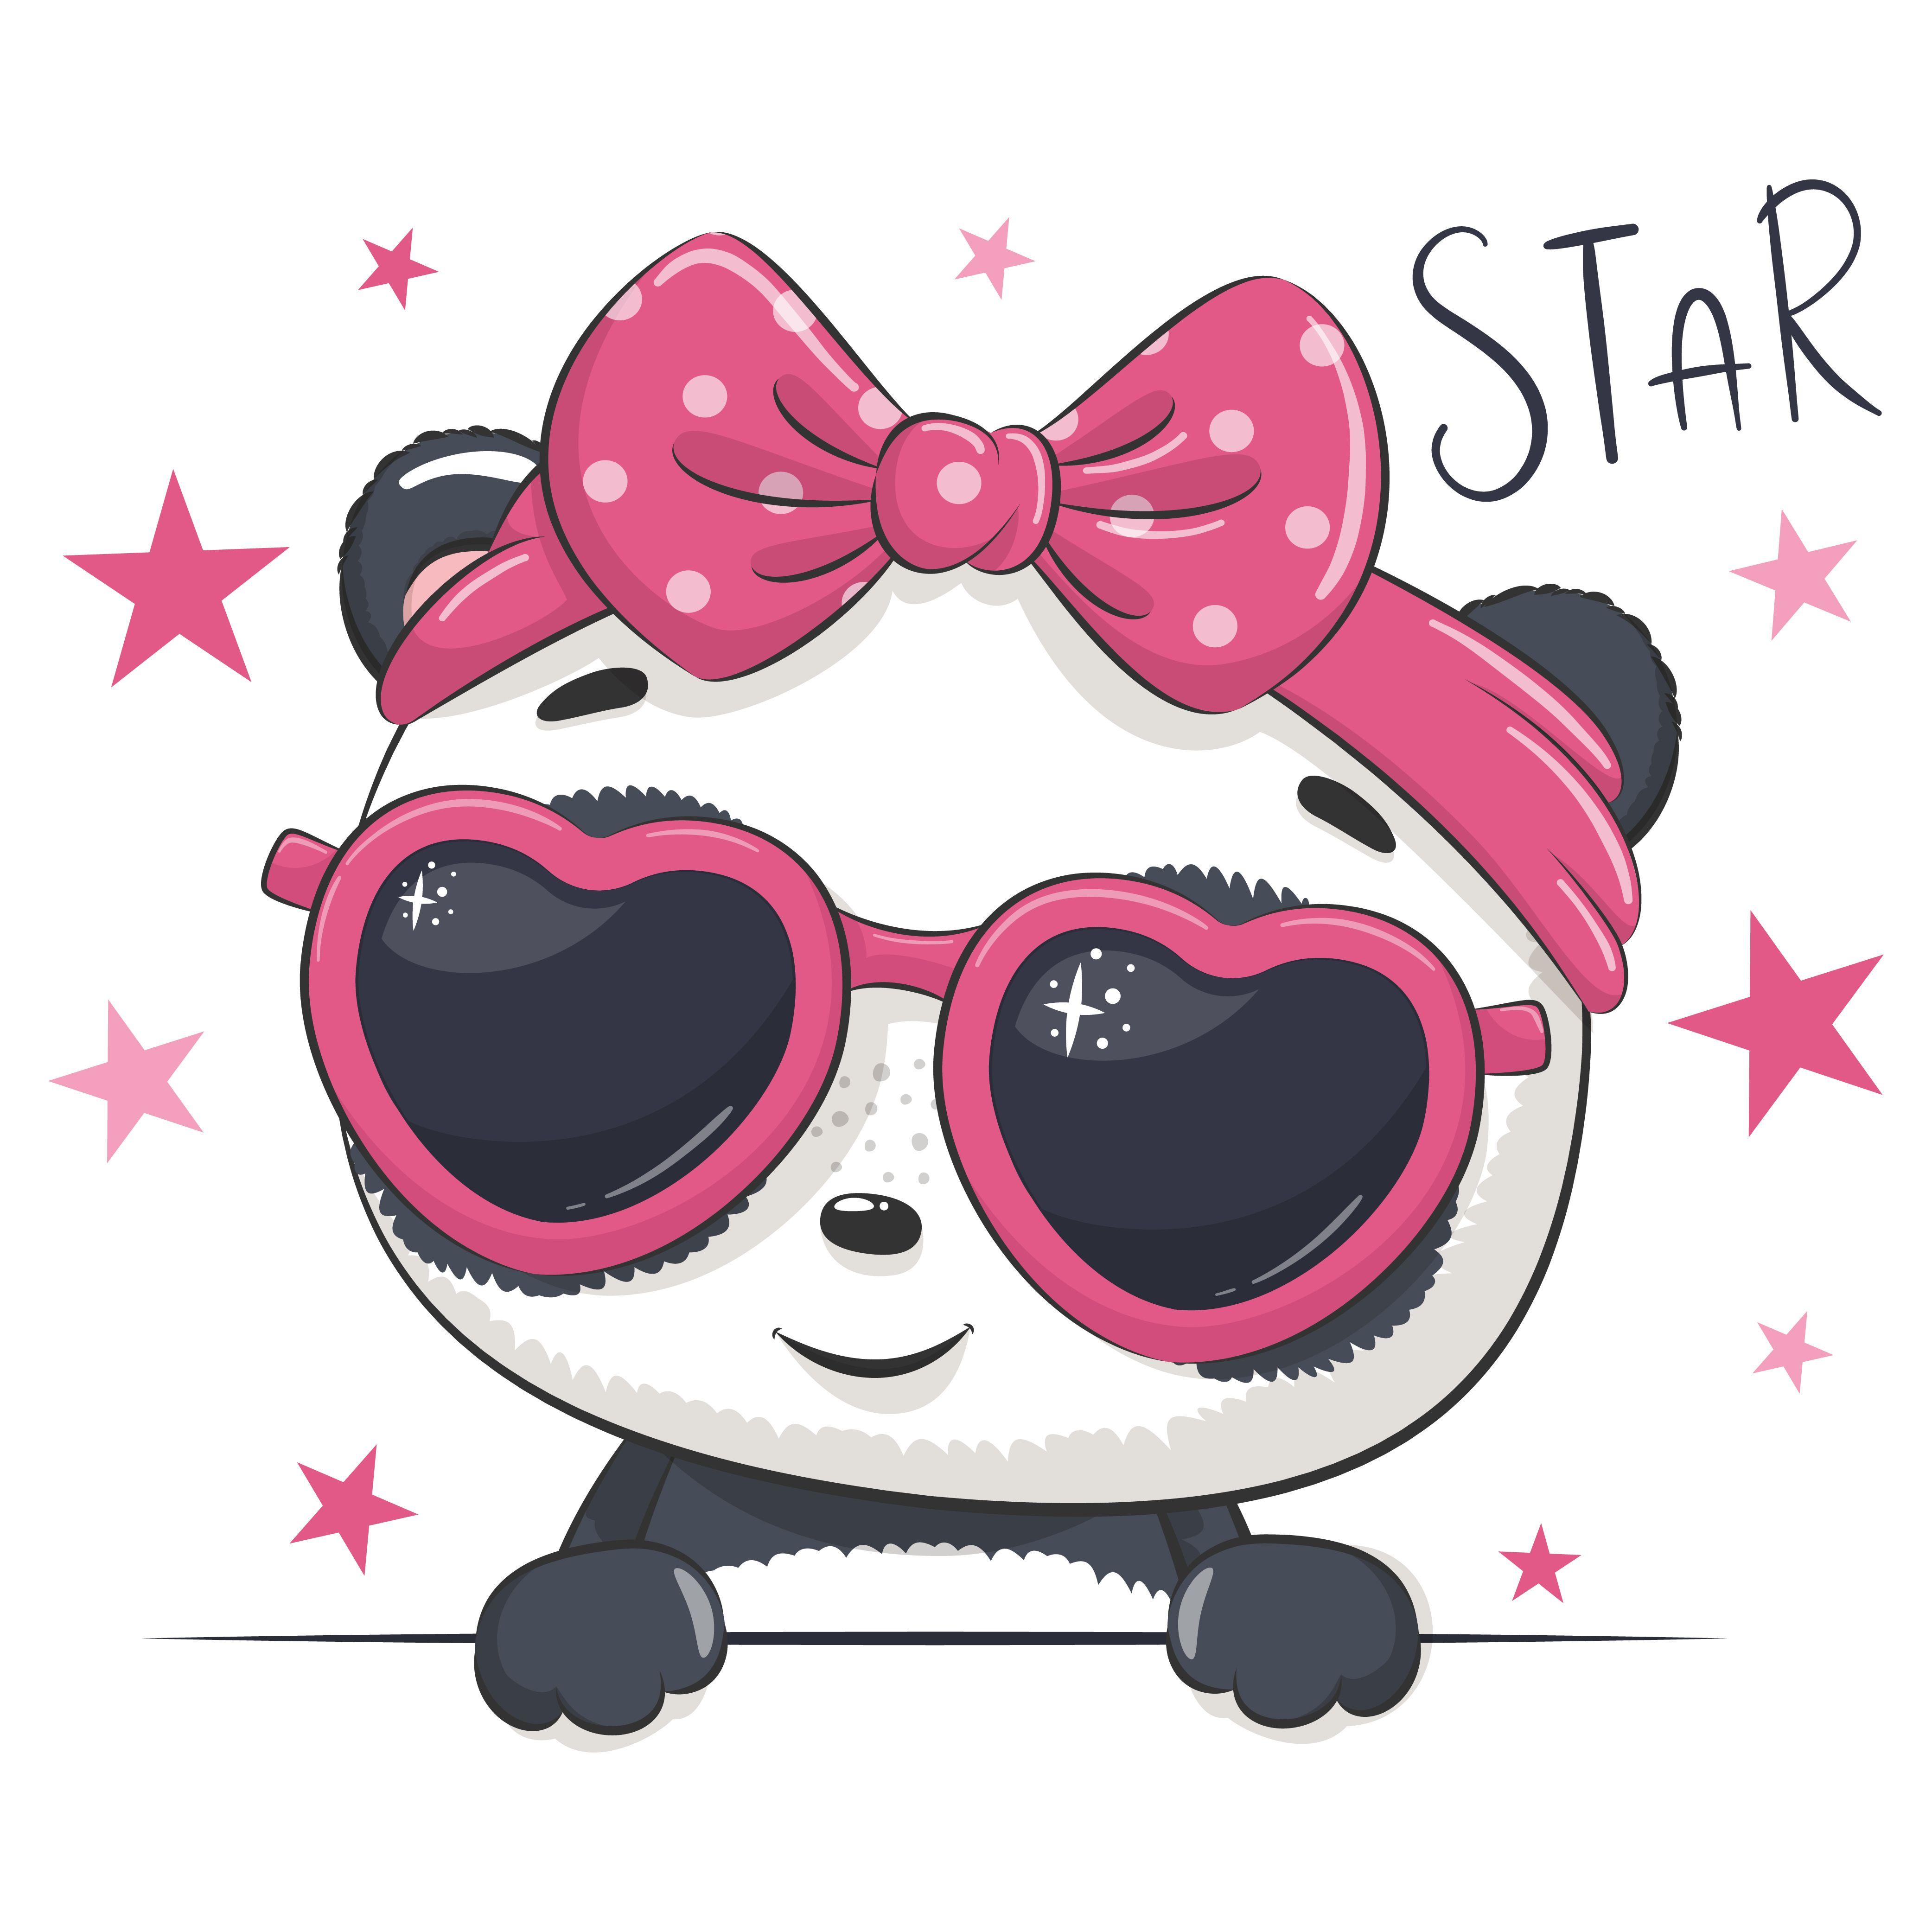 Baby Girl Clipart Cute Animal Clip Art Eps Png Jpeg Cute Etsy In 2021 Baby Girl Clipart Animal Illustration Clip Art